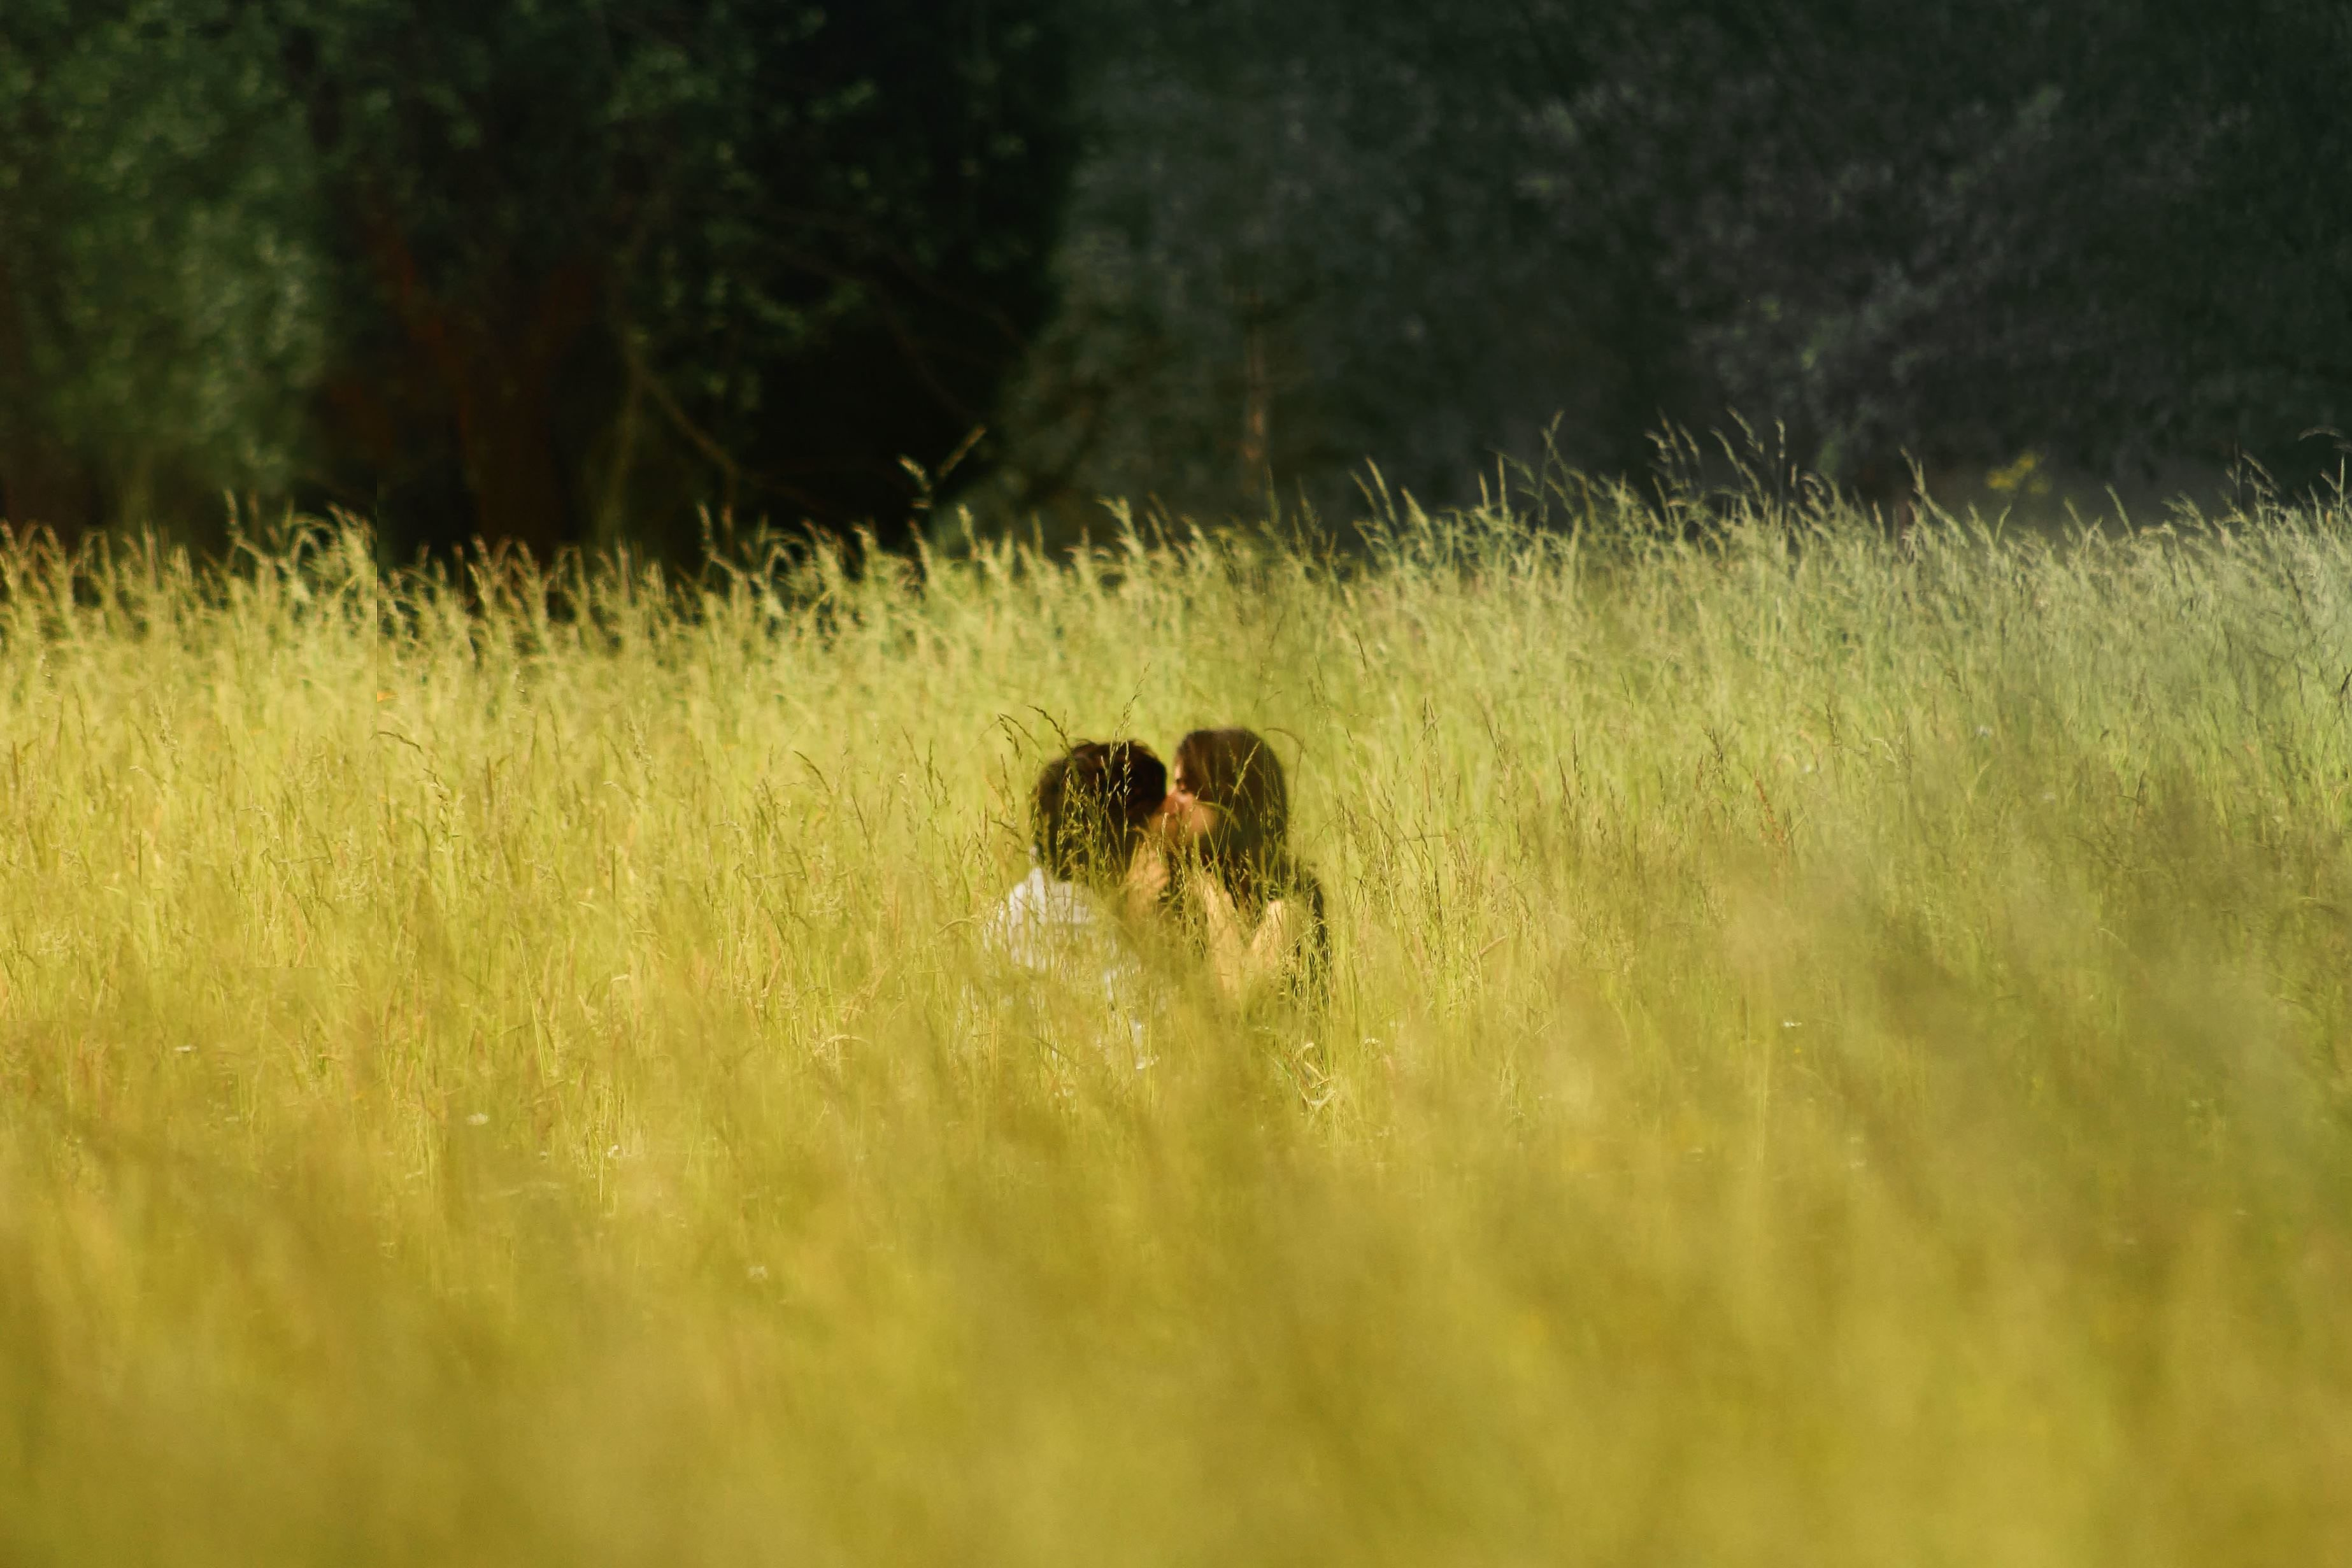 Free Picture Field Grass Boyfriend Girlfriend Kiss Love People Romance Romantic